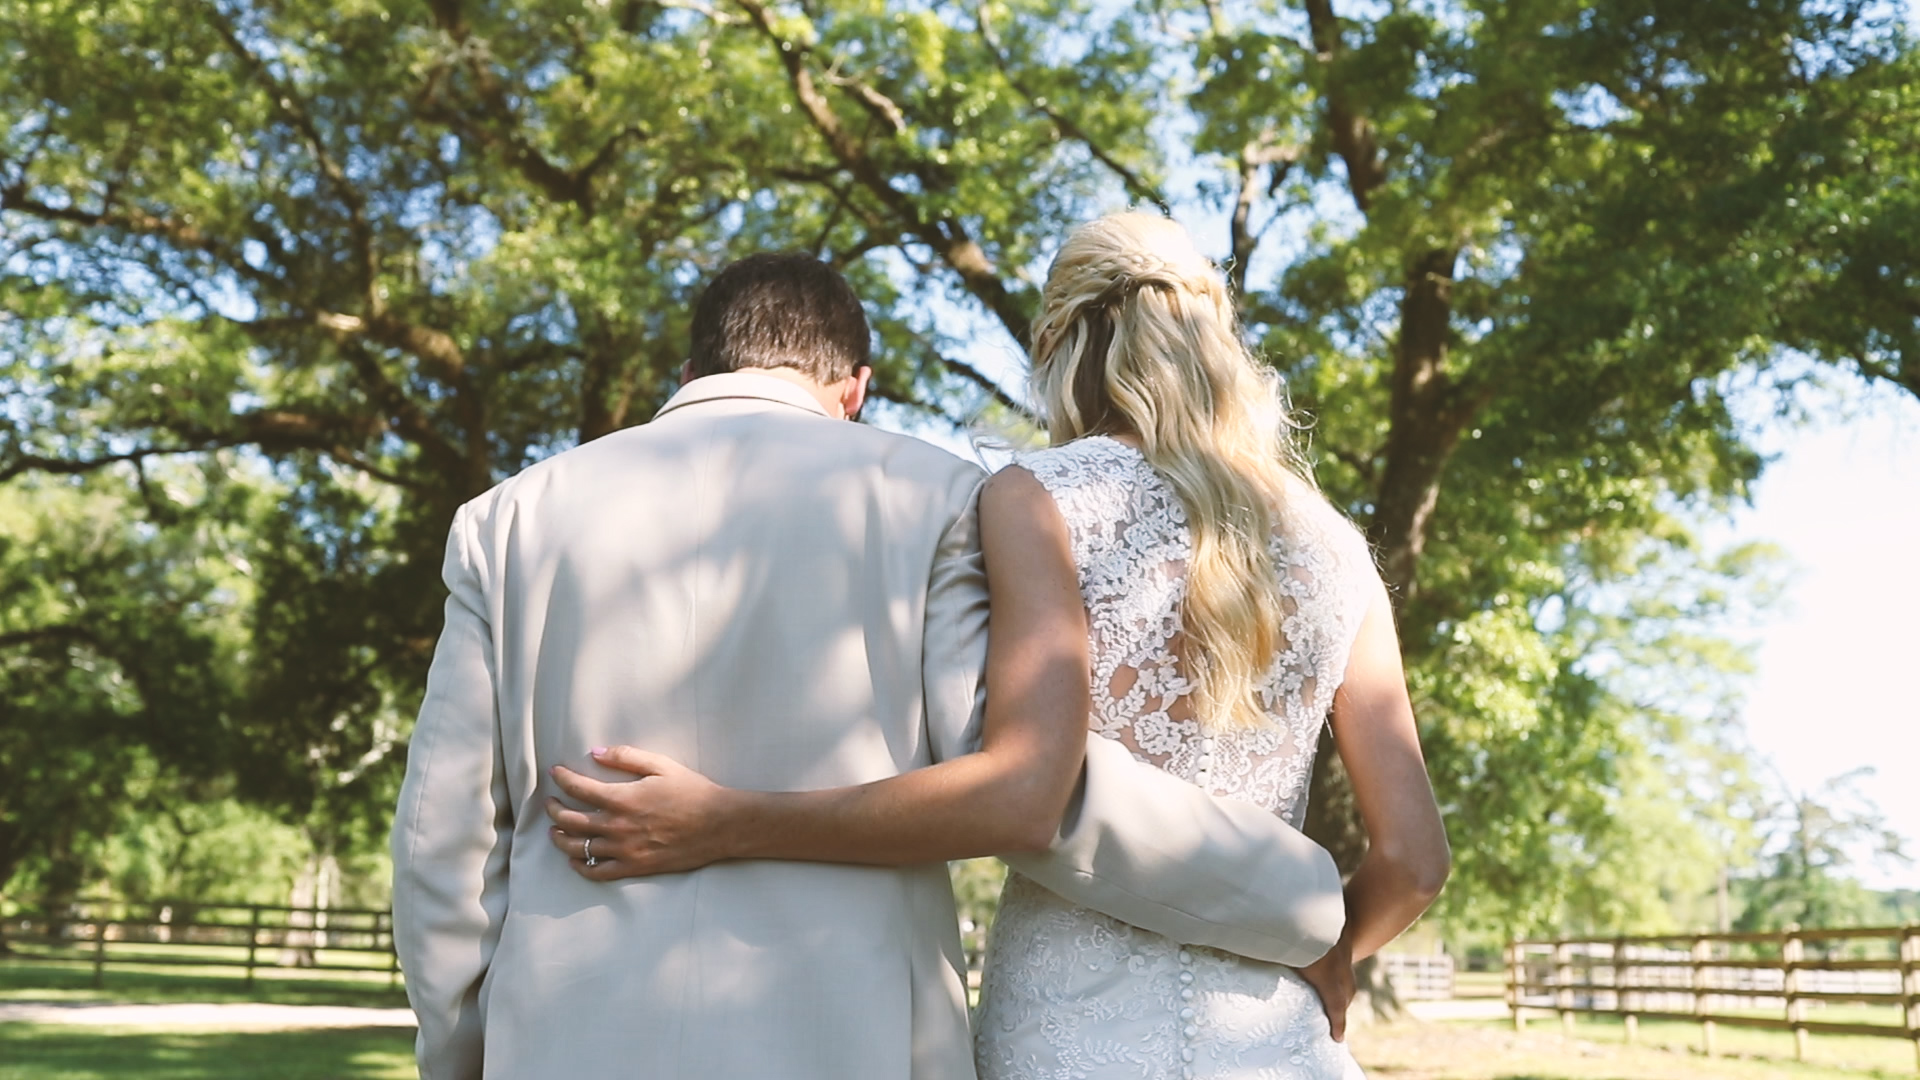 Wedding First Look - Bride Film